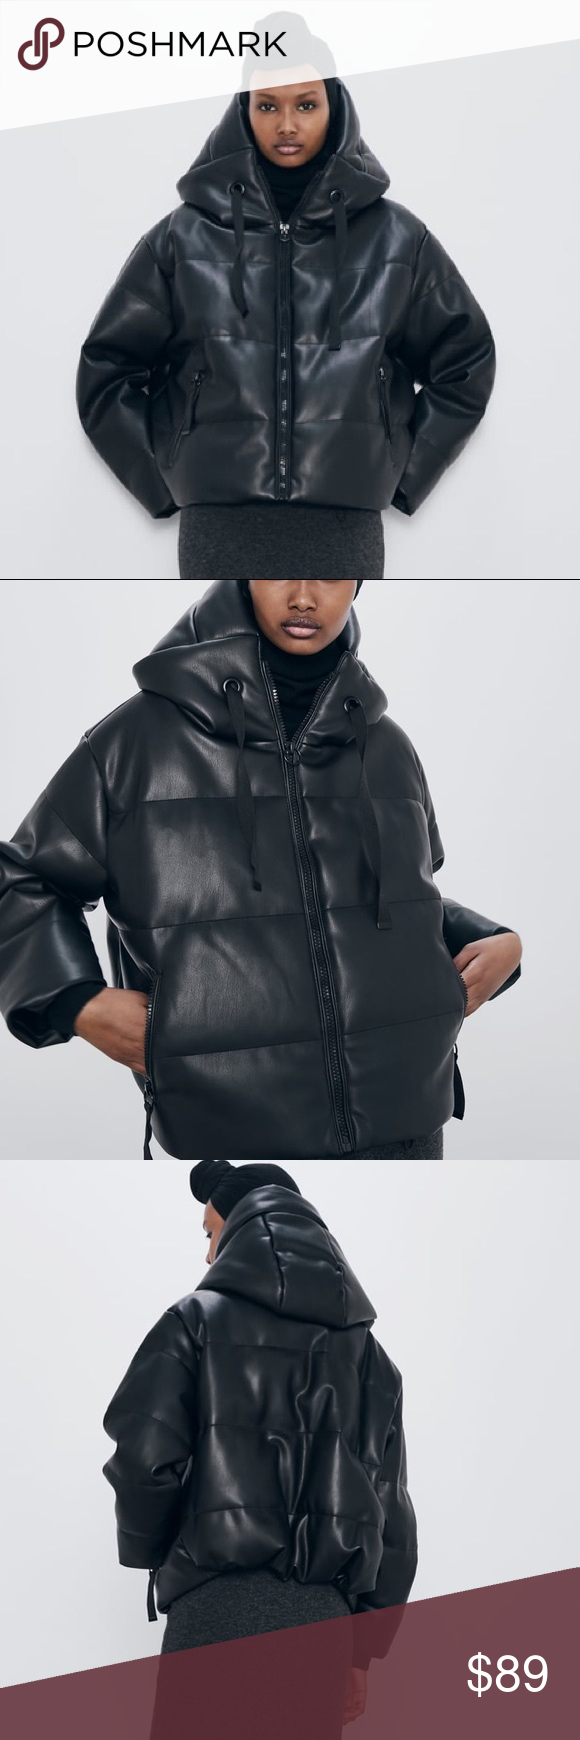 Zara Faux Leather Puffer Jacket Leather Jacket Leather Puffer Jacket Zara [ 1740 x 580 Pixel ]